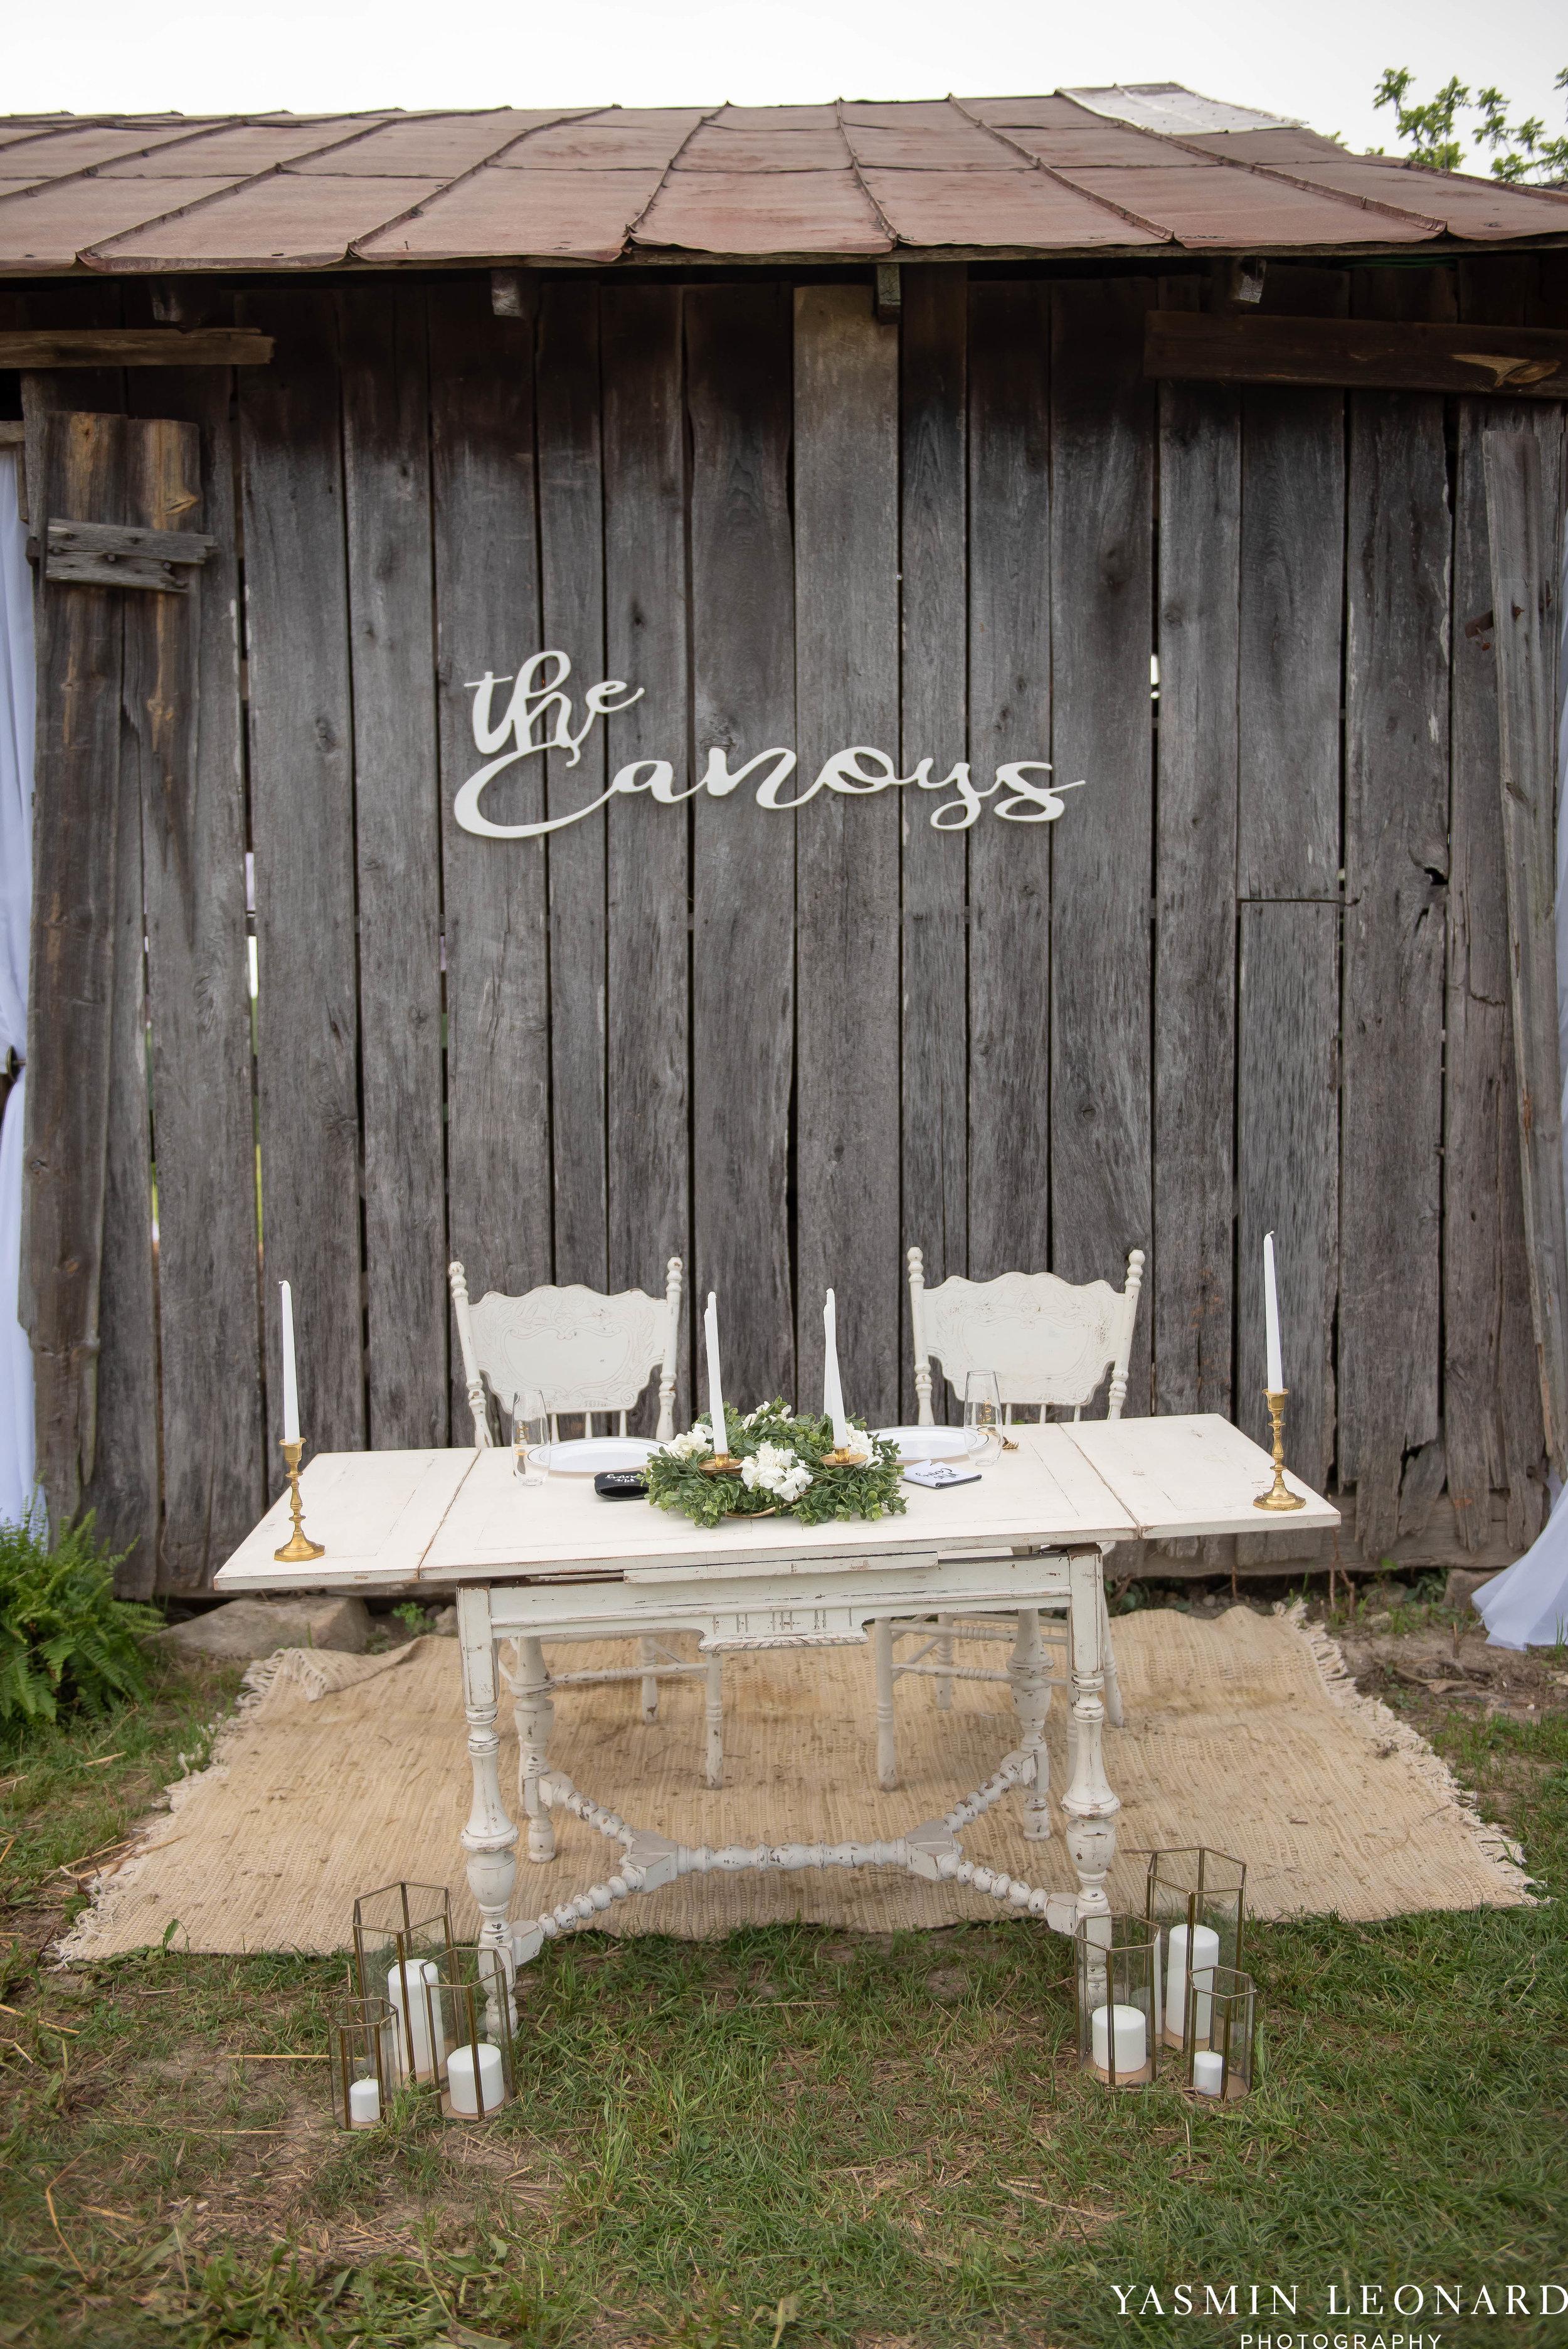 Rain on your wedding day - Rainy Wedding - Plan B for Rain - What to do if it rains on your wedding day - Wedding Inspiration - Outdoor wedding ideas - Rainy Wedding Pictures - Yasmin Leonard Photography-49.jpg